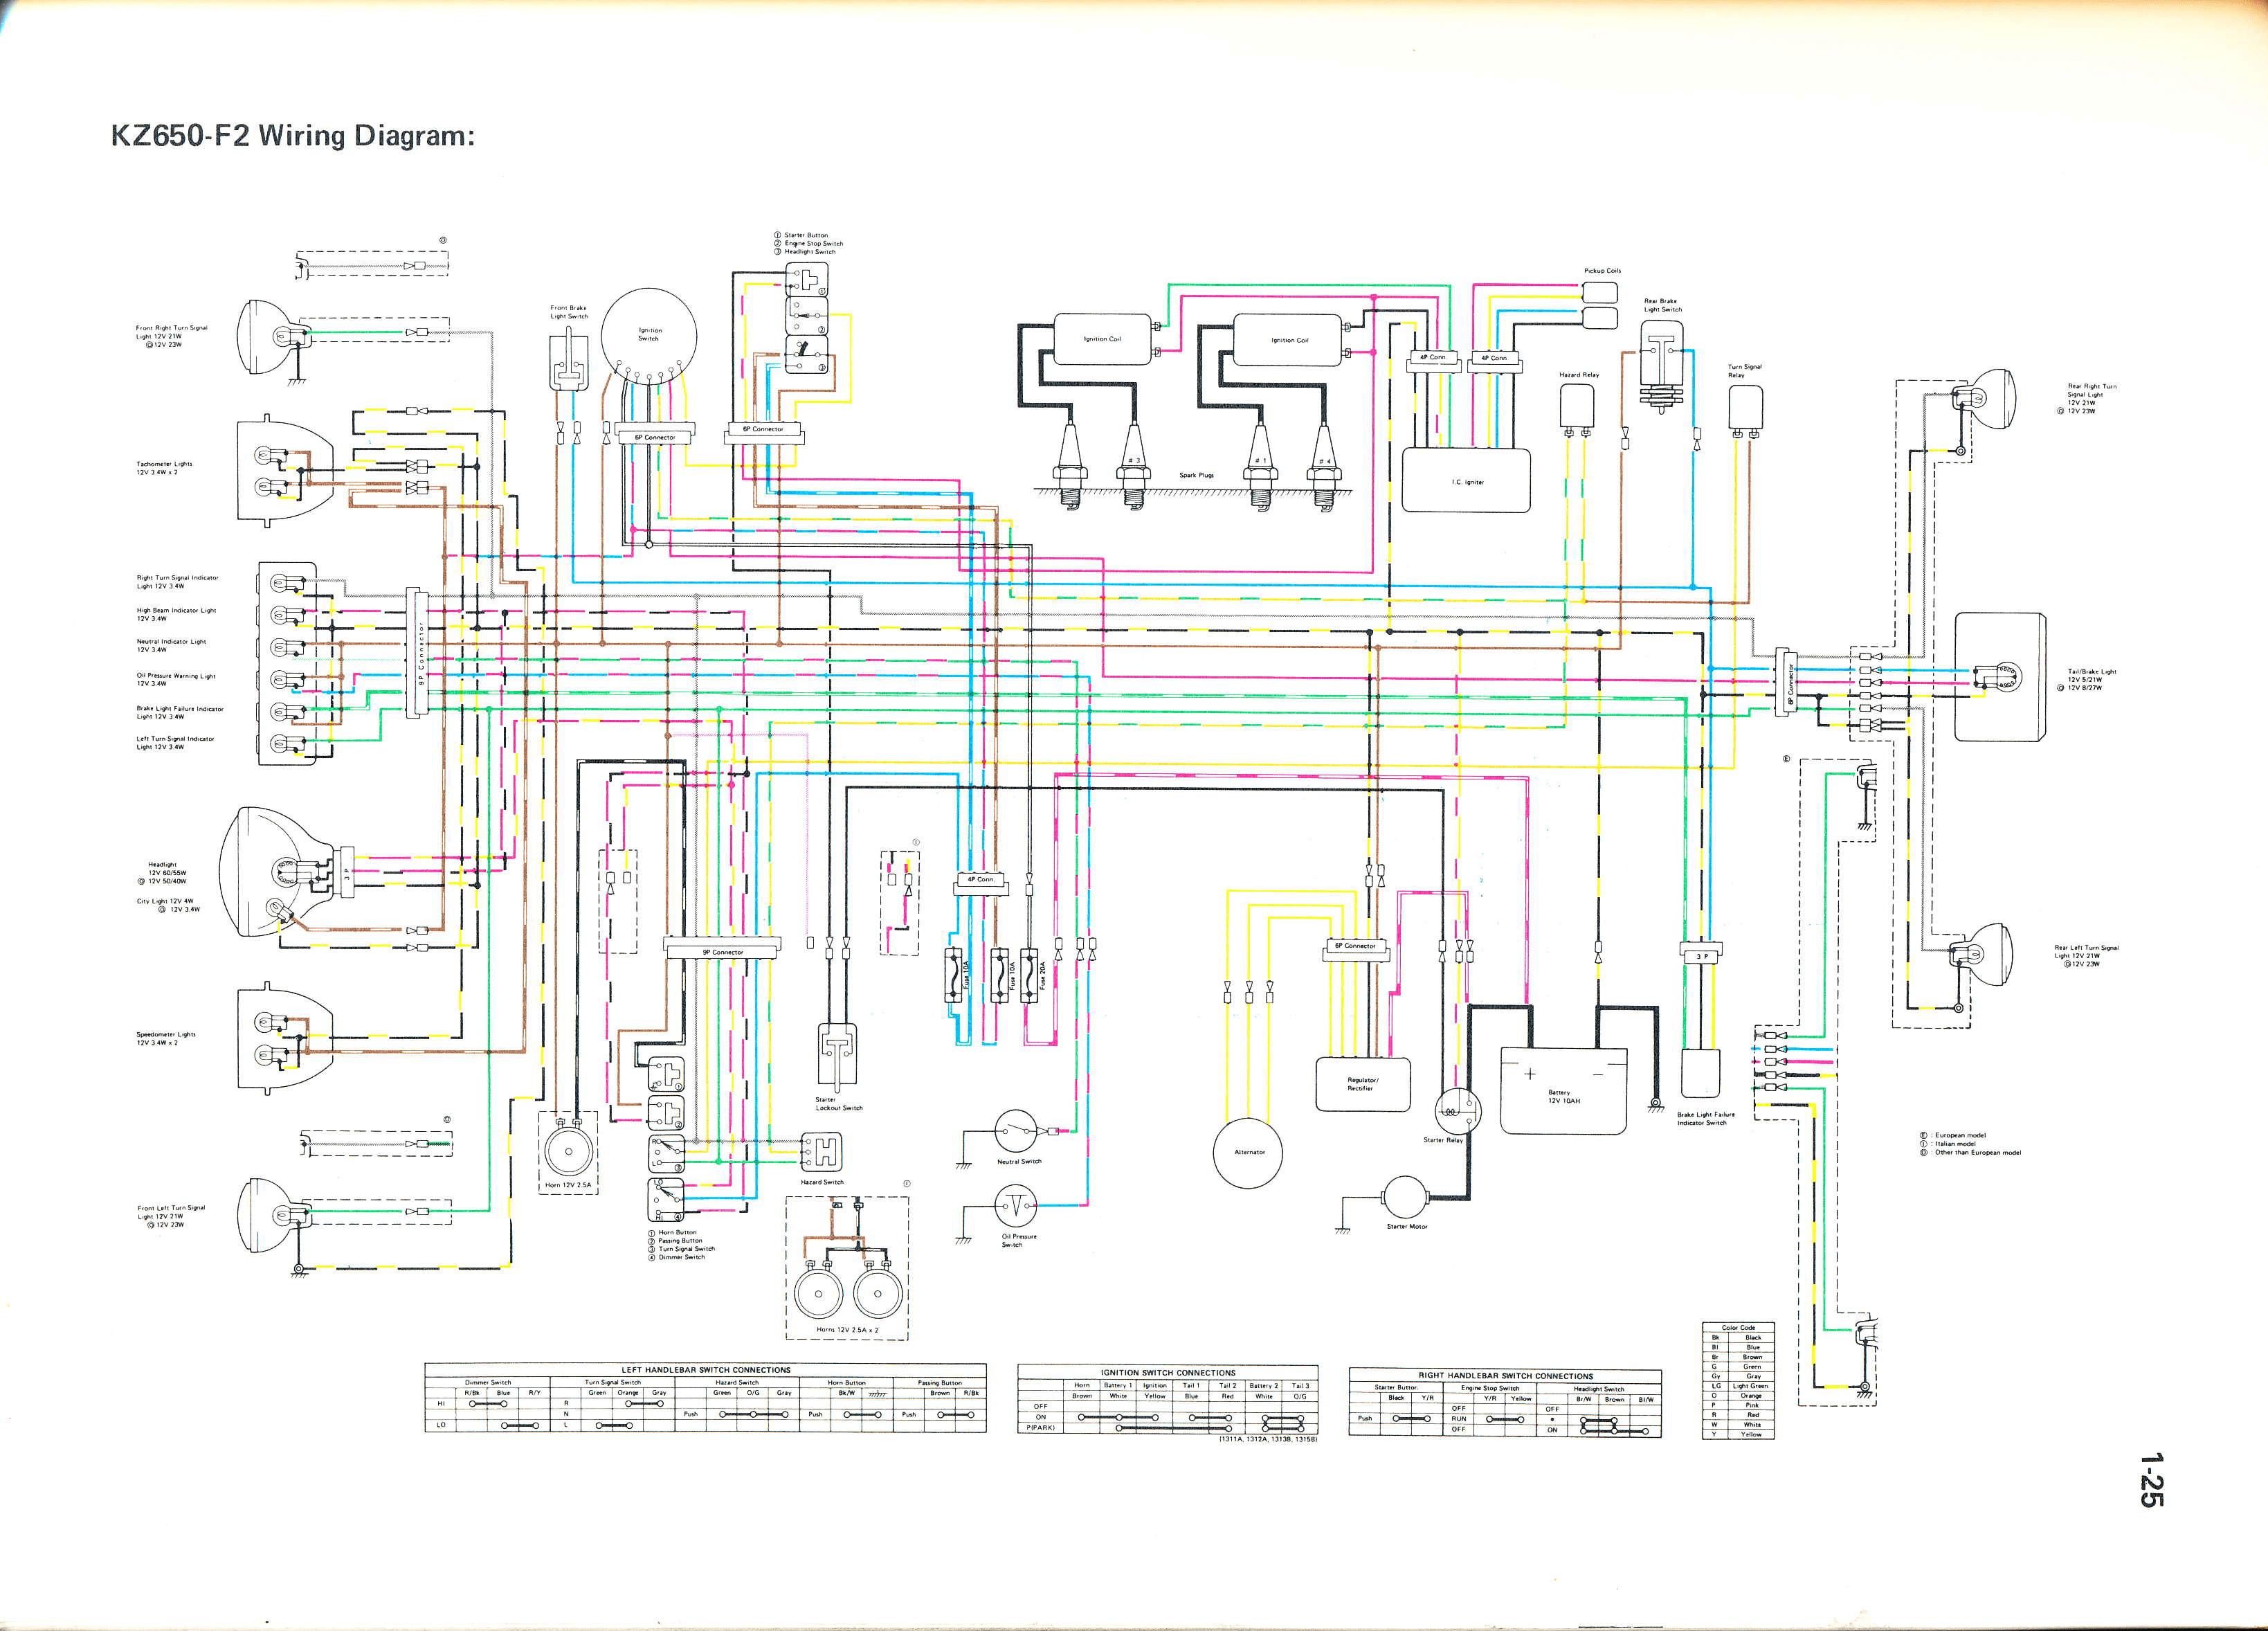 2000 Honda 400ex Wiring Diagram - Ford 3 Post Solenoid Wiring Diagram for Wiring  Diagram Schematics | Trx 400ex Wiring Diagram |  | Wiring Diagram Schematics